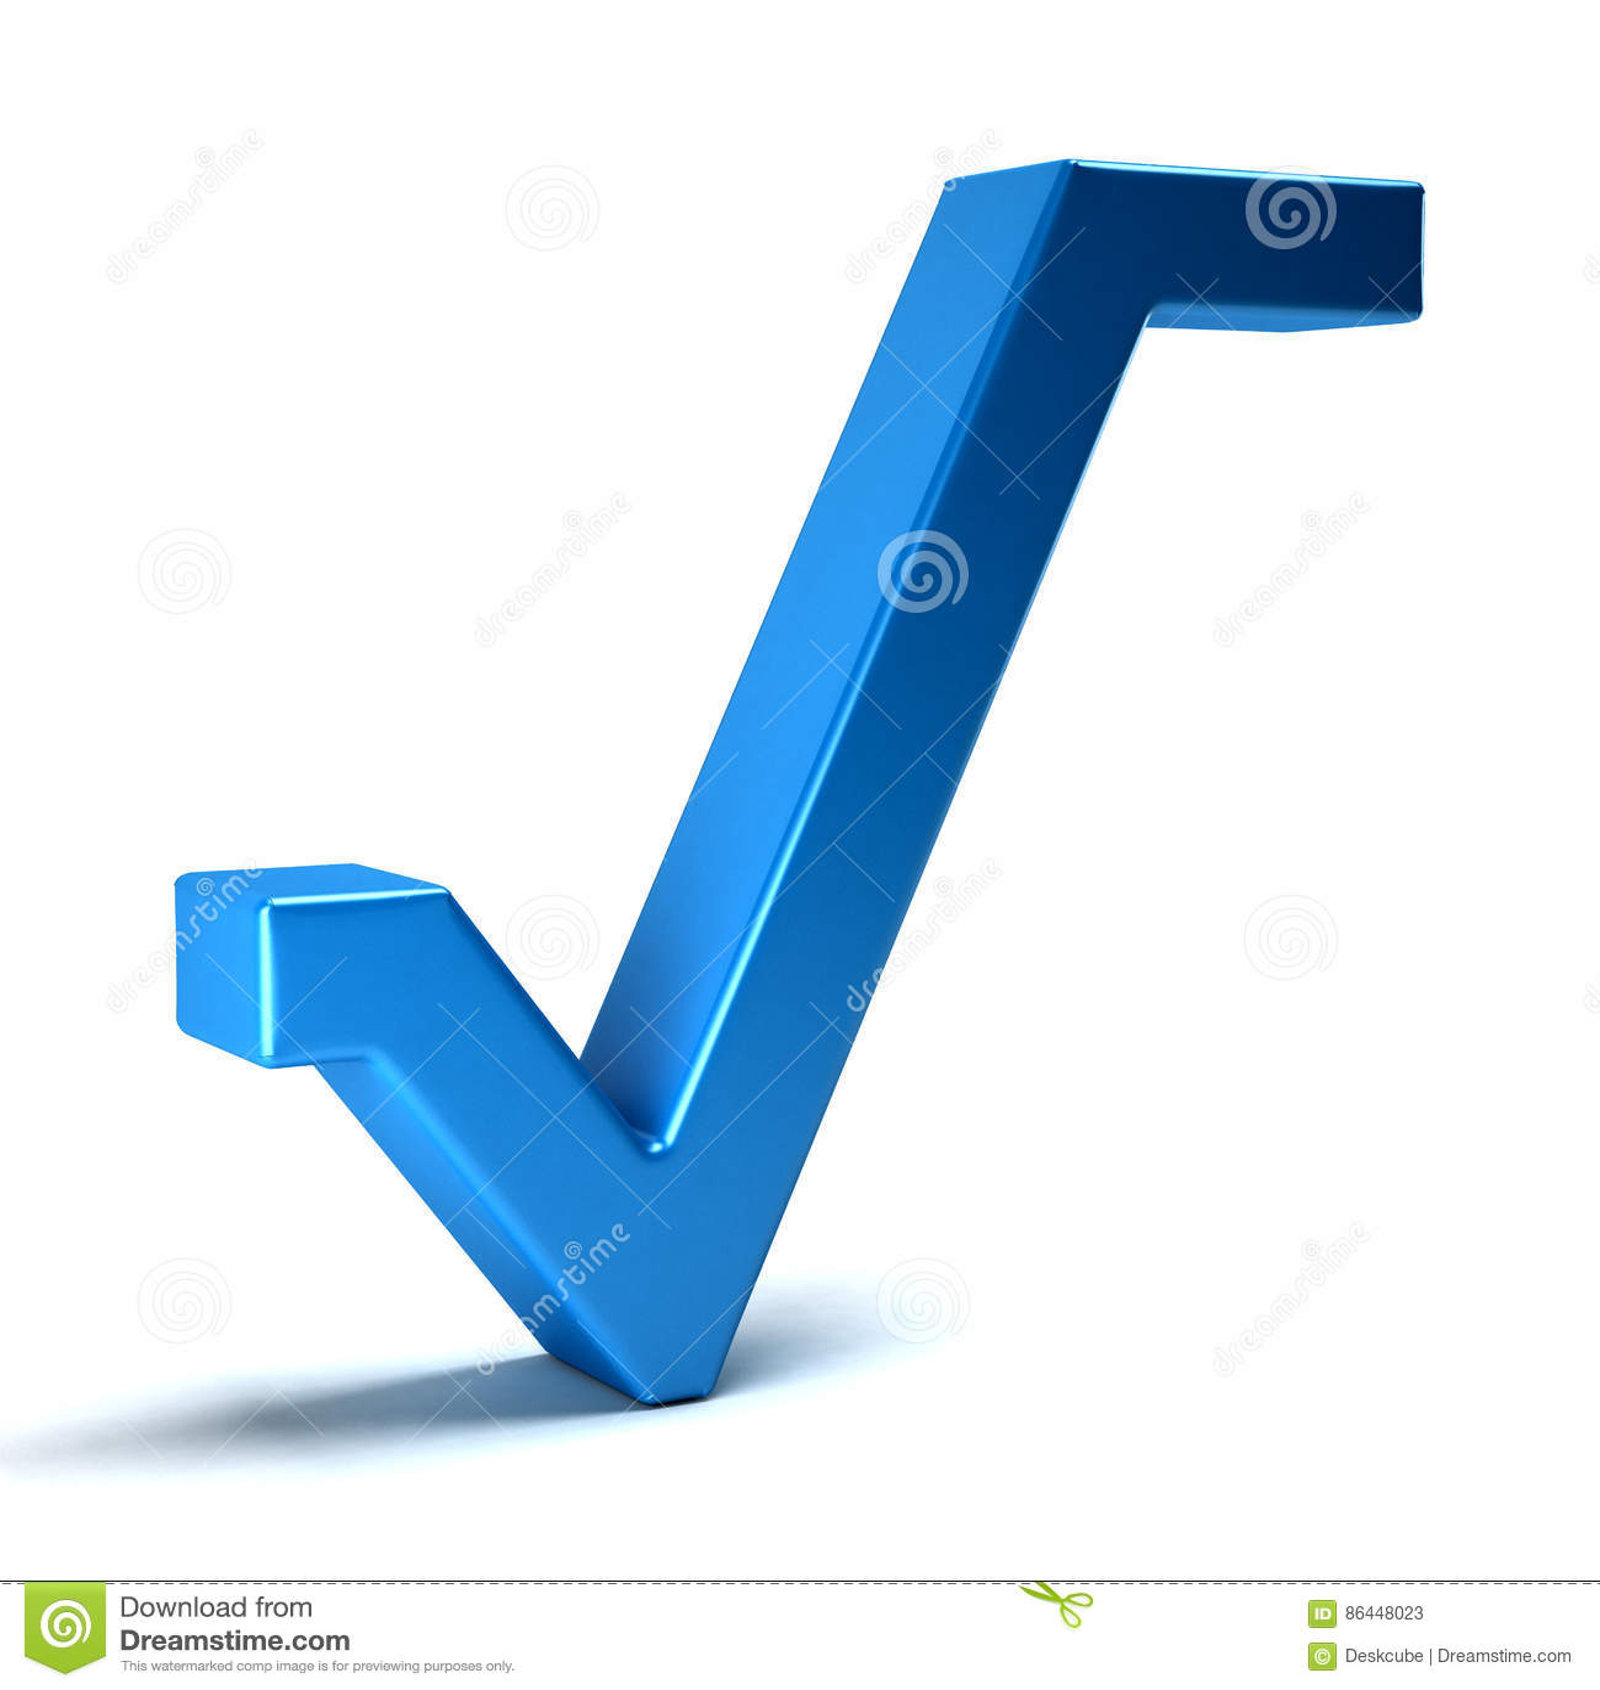 Square root math symbol stock illustration illustration of equal square root math symbol buycottarizona Images